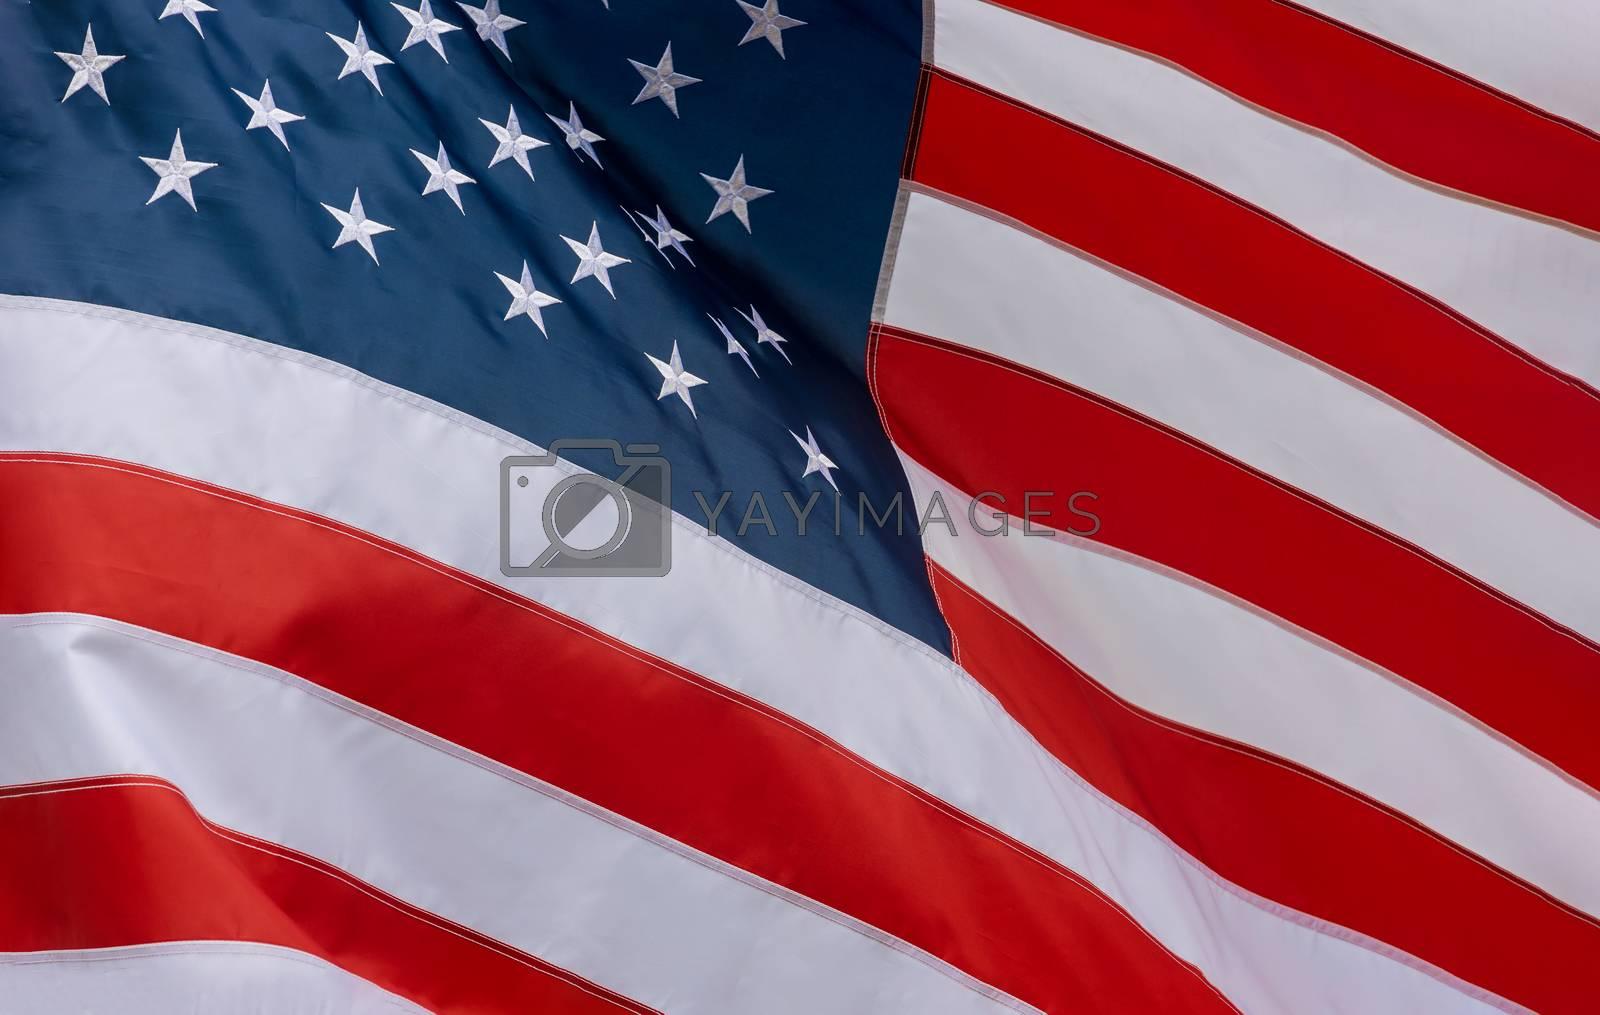 Closeup of ruffled American flag waving in the wind